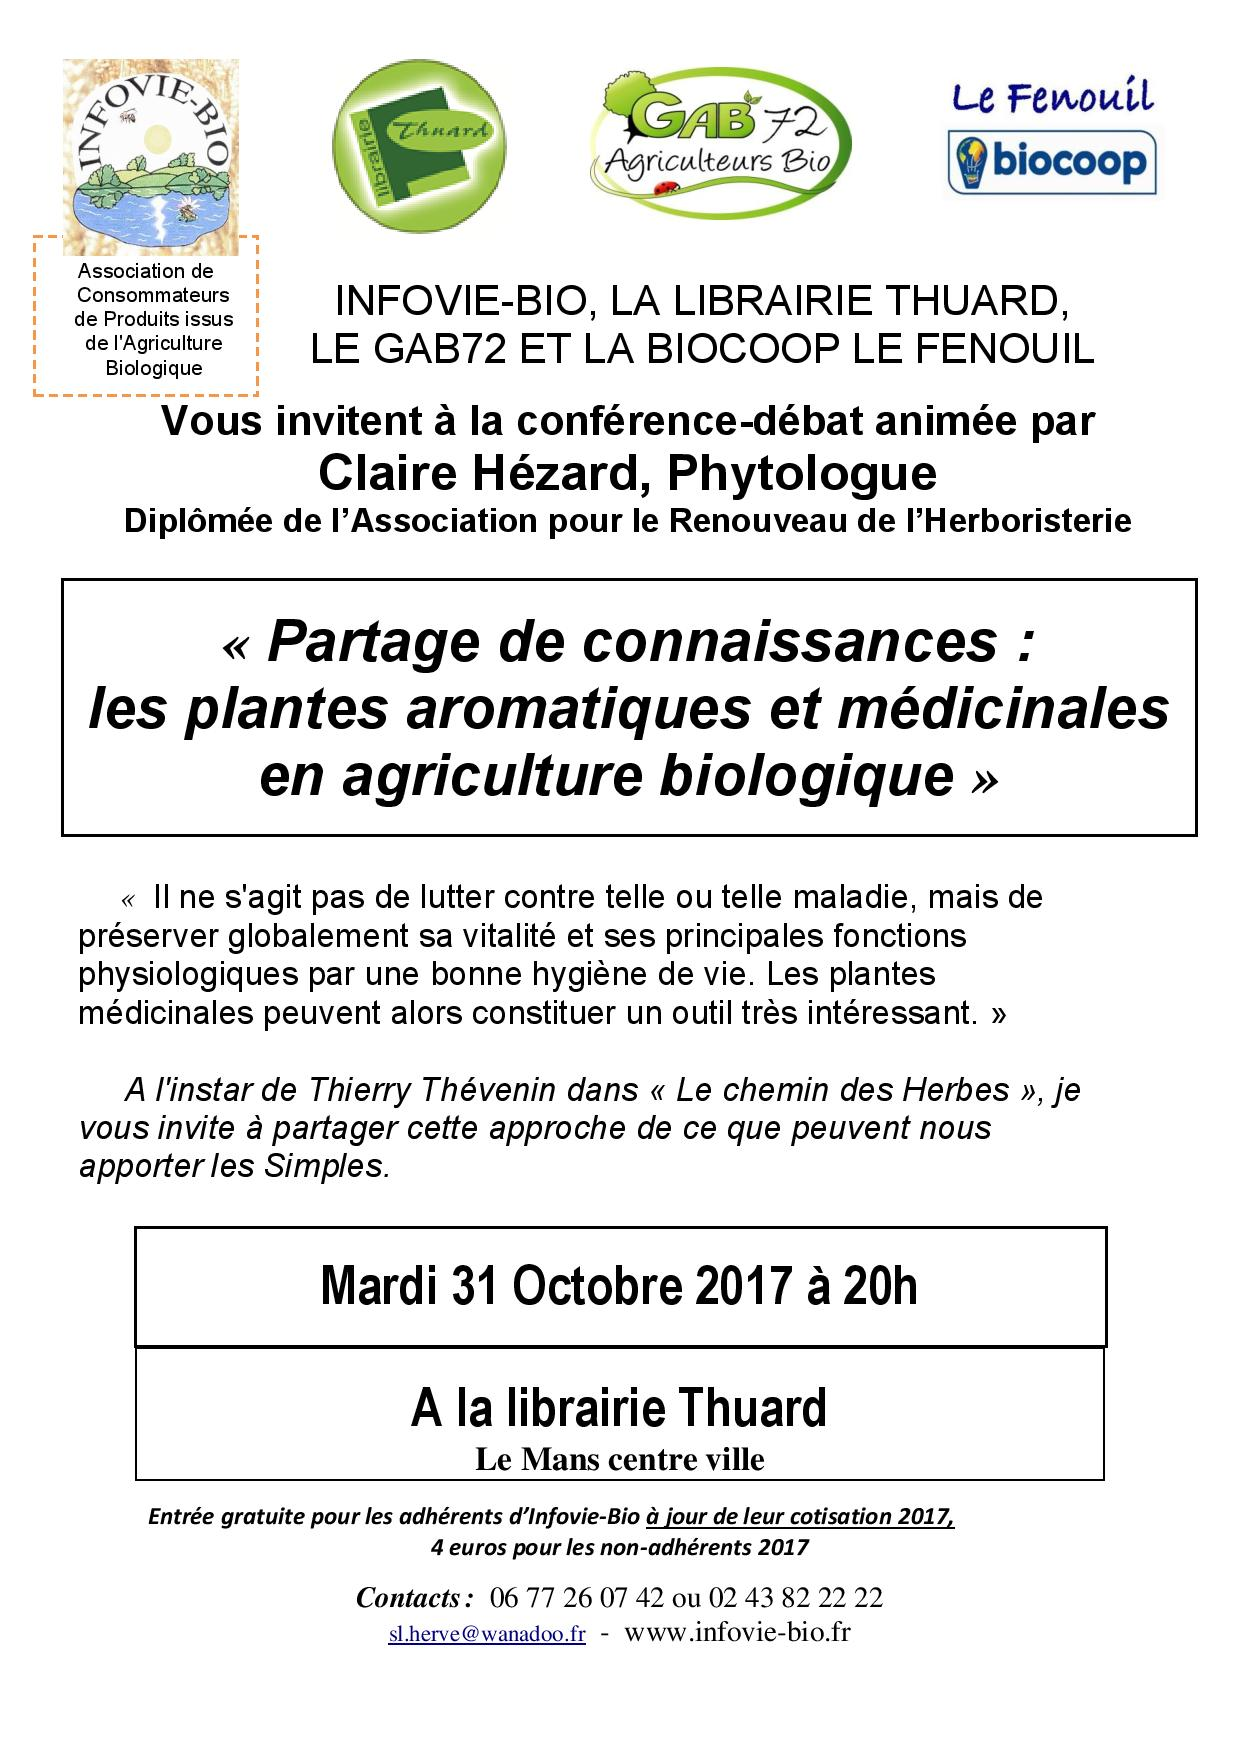 affiche_conference_claire_hezard_plantes_medicinales_pdf_-page-001.jpg